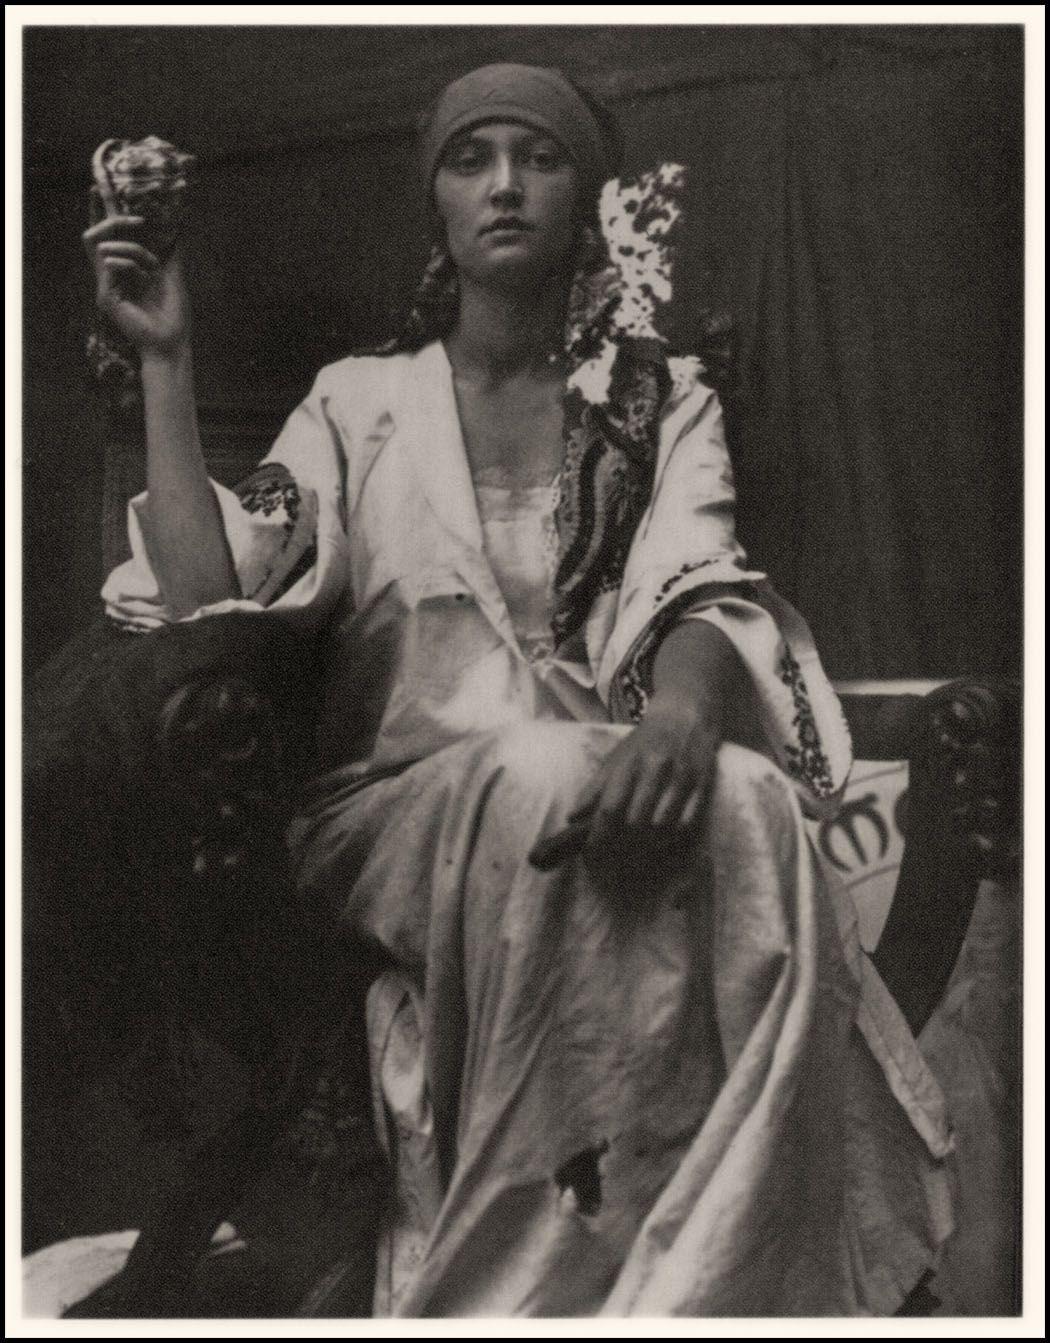 Alphonse Mucha. model. 1919. black and white photograph.